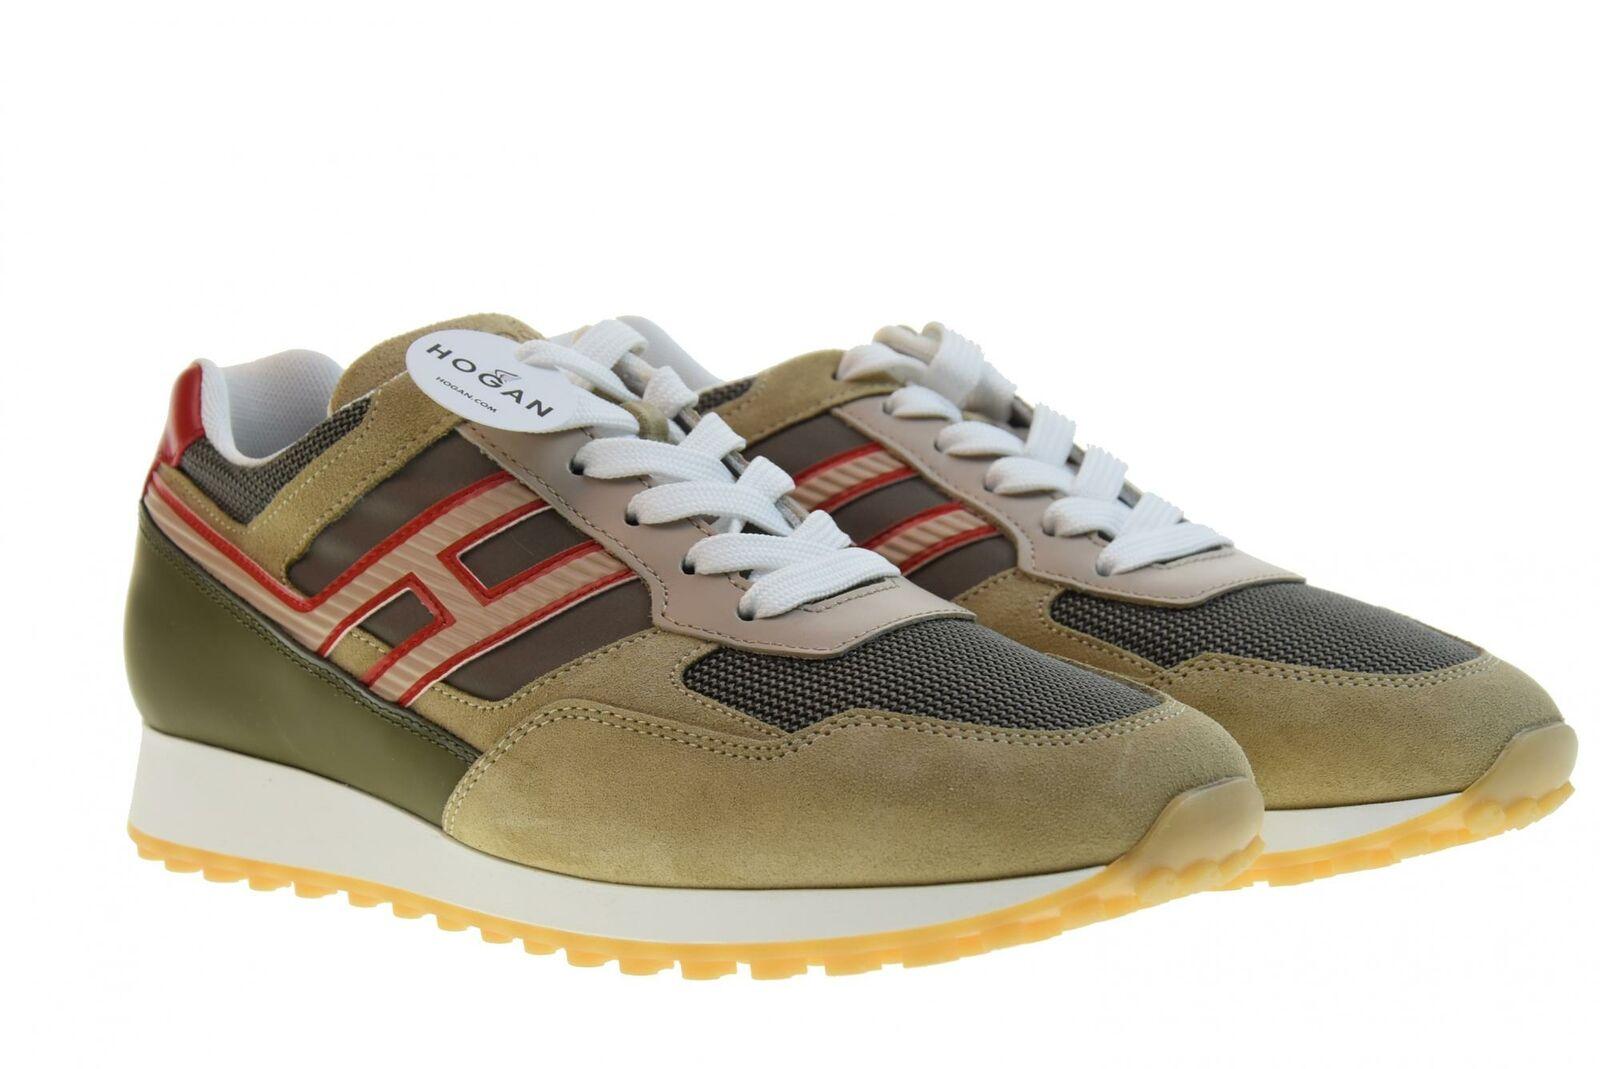 Hogan P19g zapatos Men zapatillas HXM4290BD80KW1672S H429 MOD.H termoformat